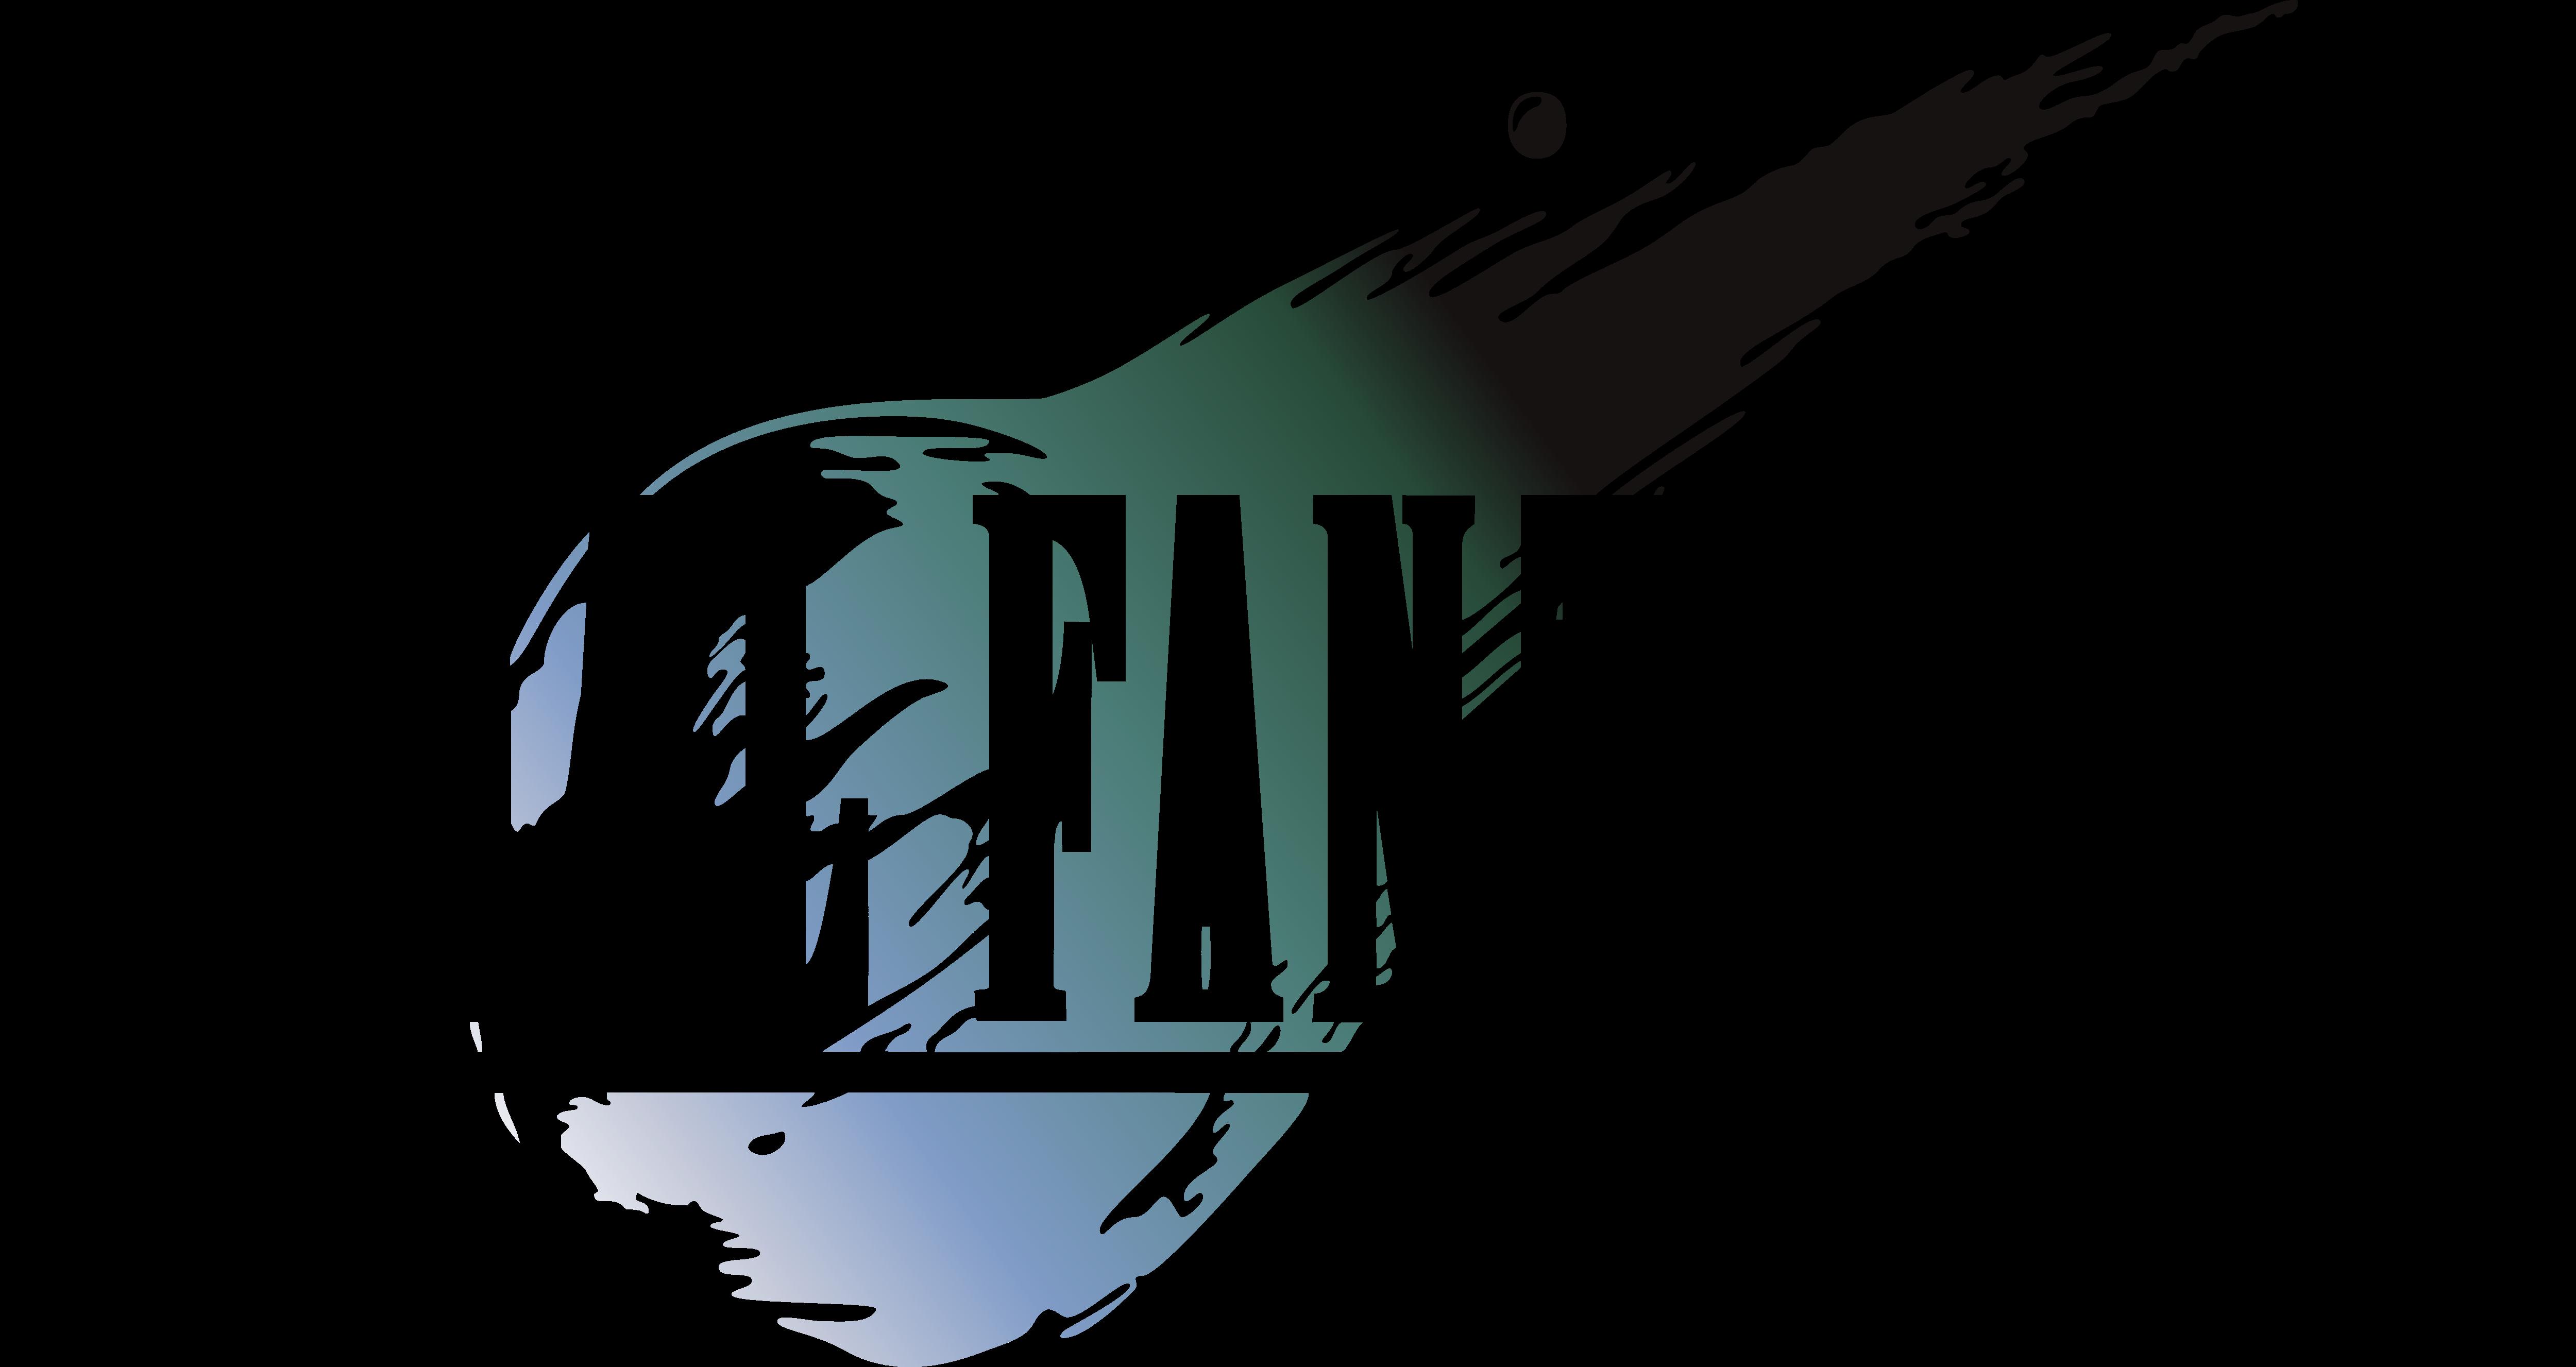 final fantasy � logos download